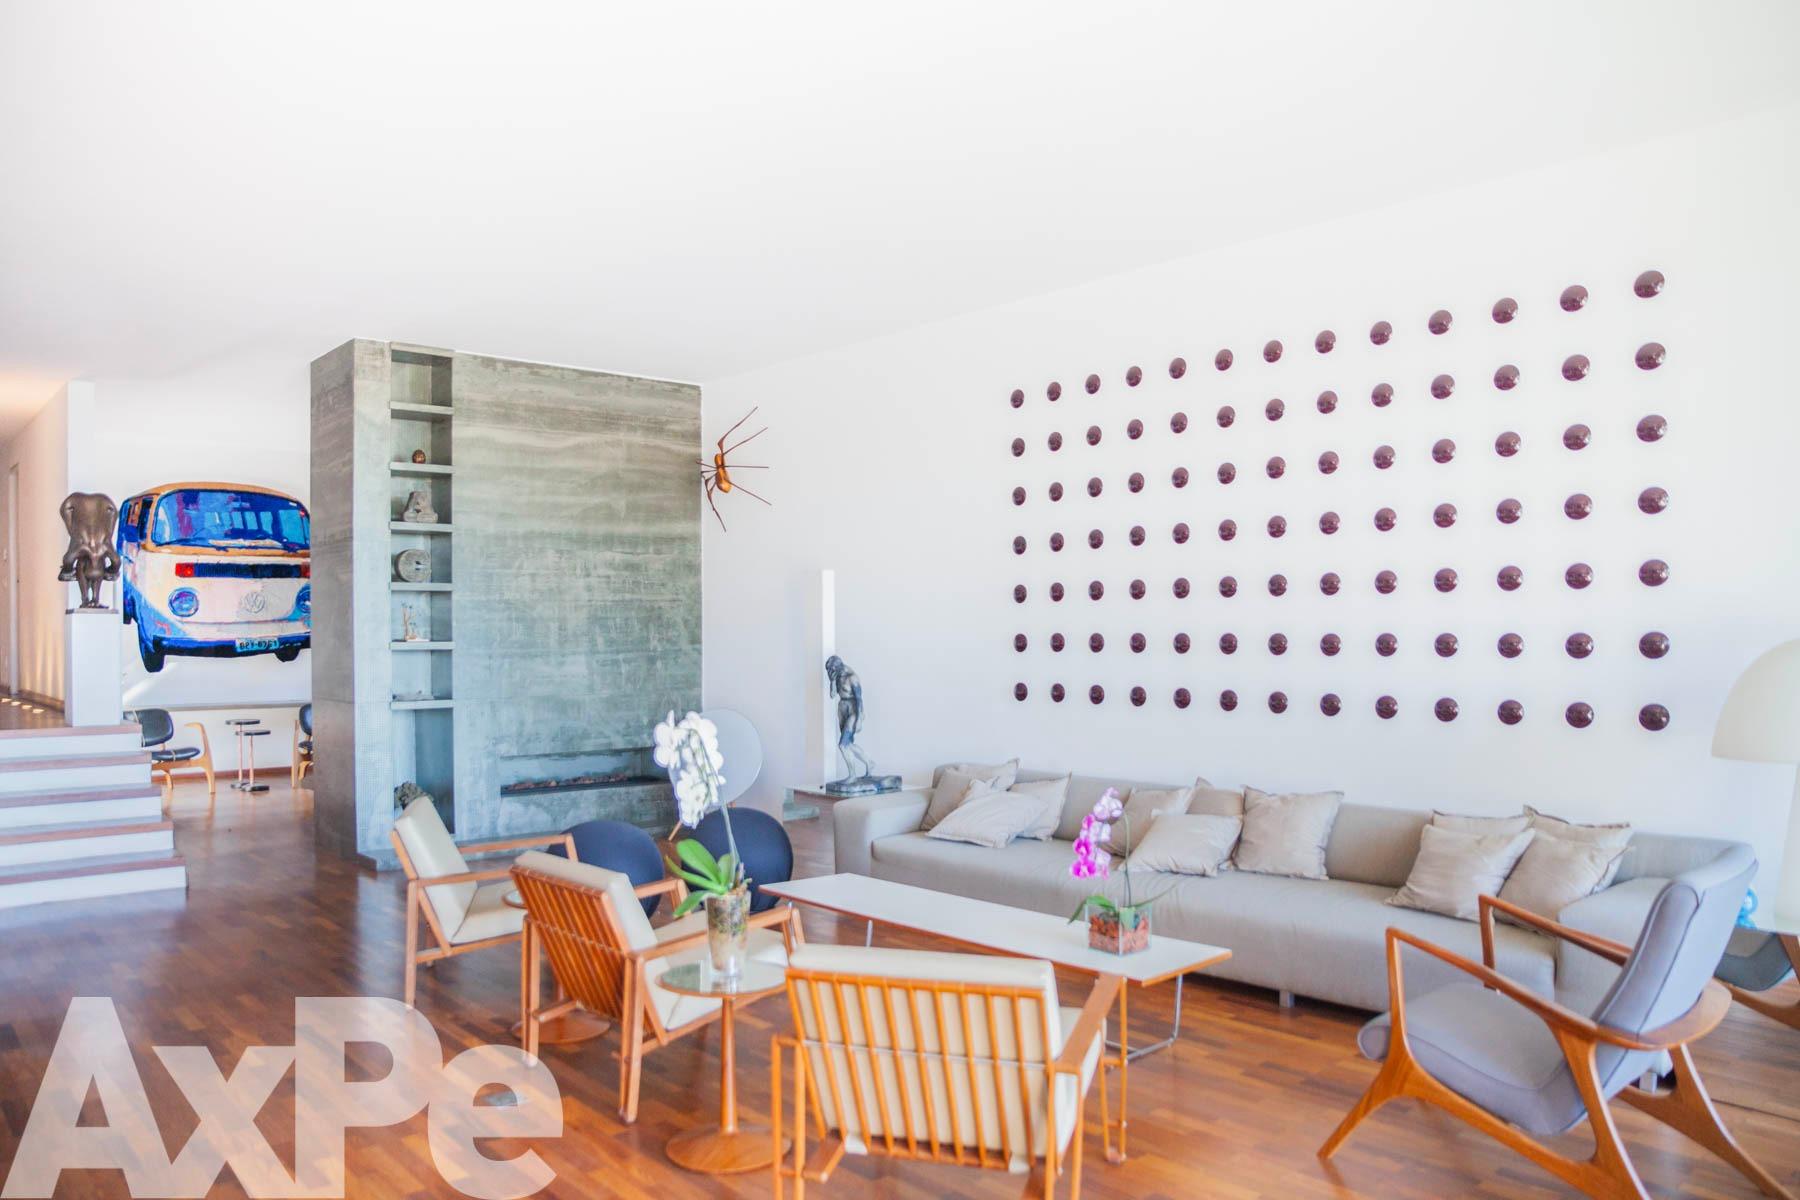 Axpe Casa - AX145922